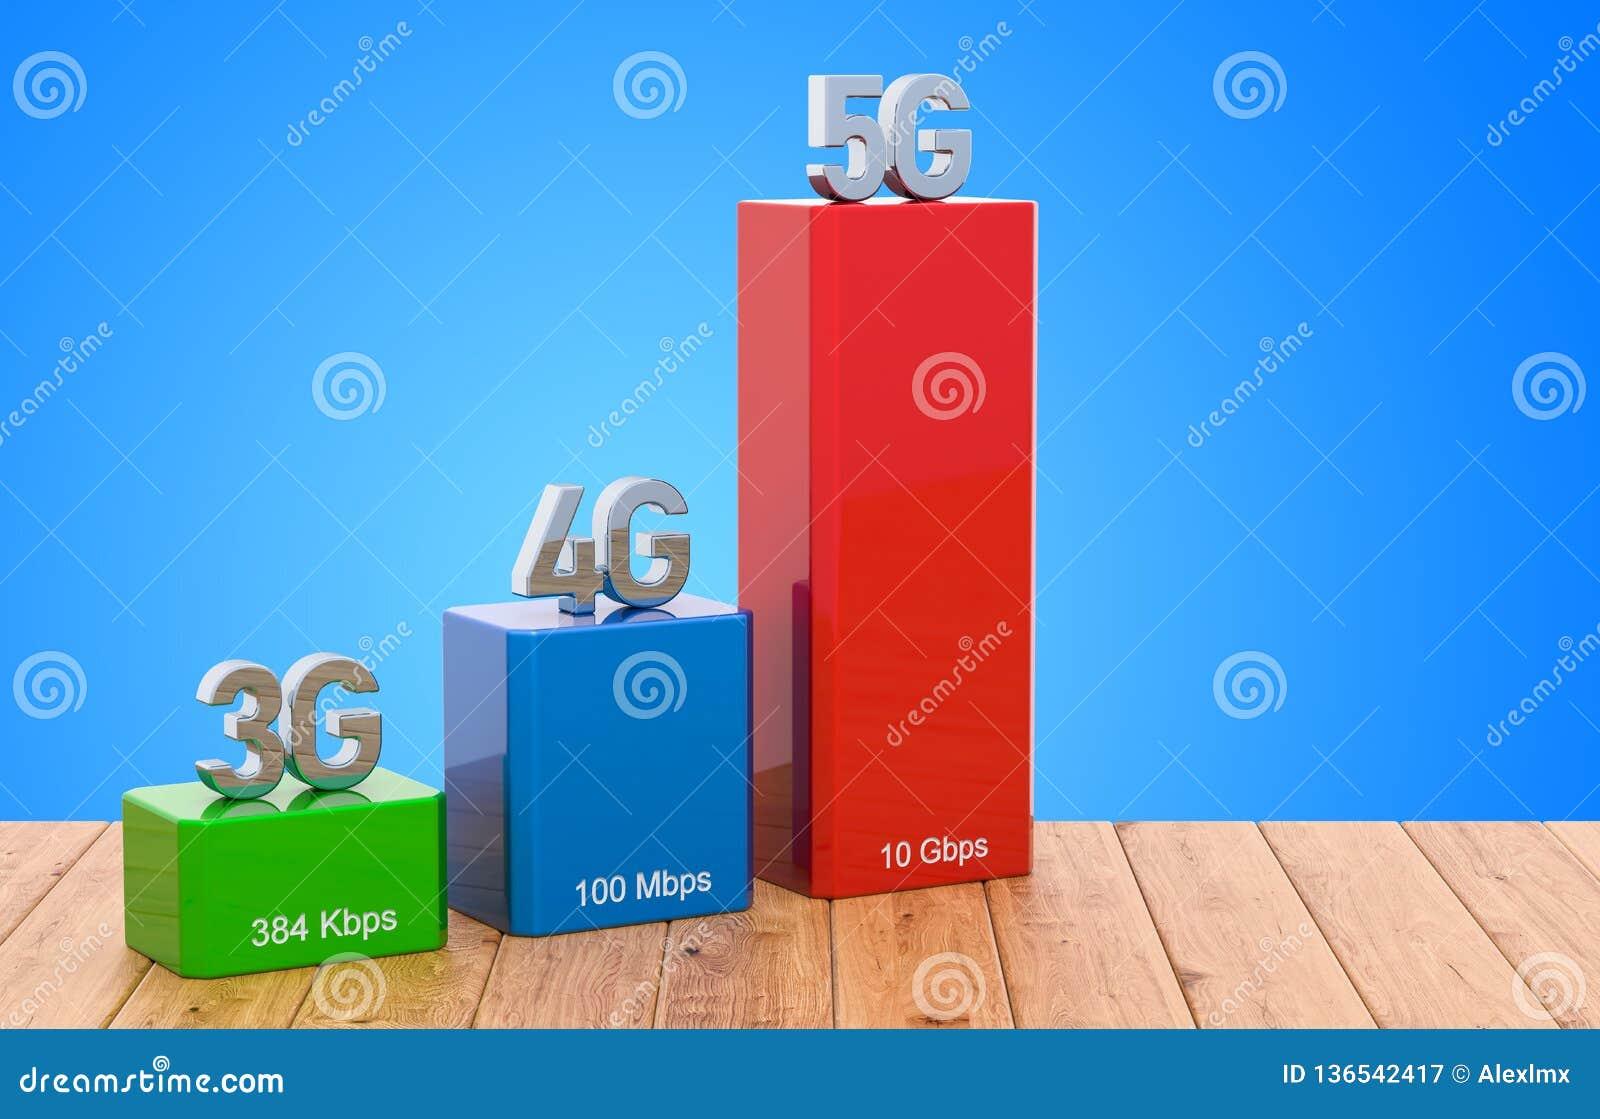 3G, 4G, 5G Wireless Network Speed Evolution Concept On The